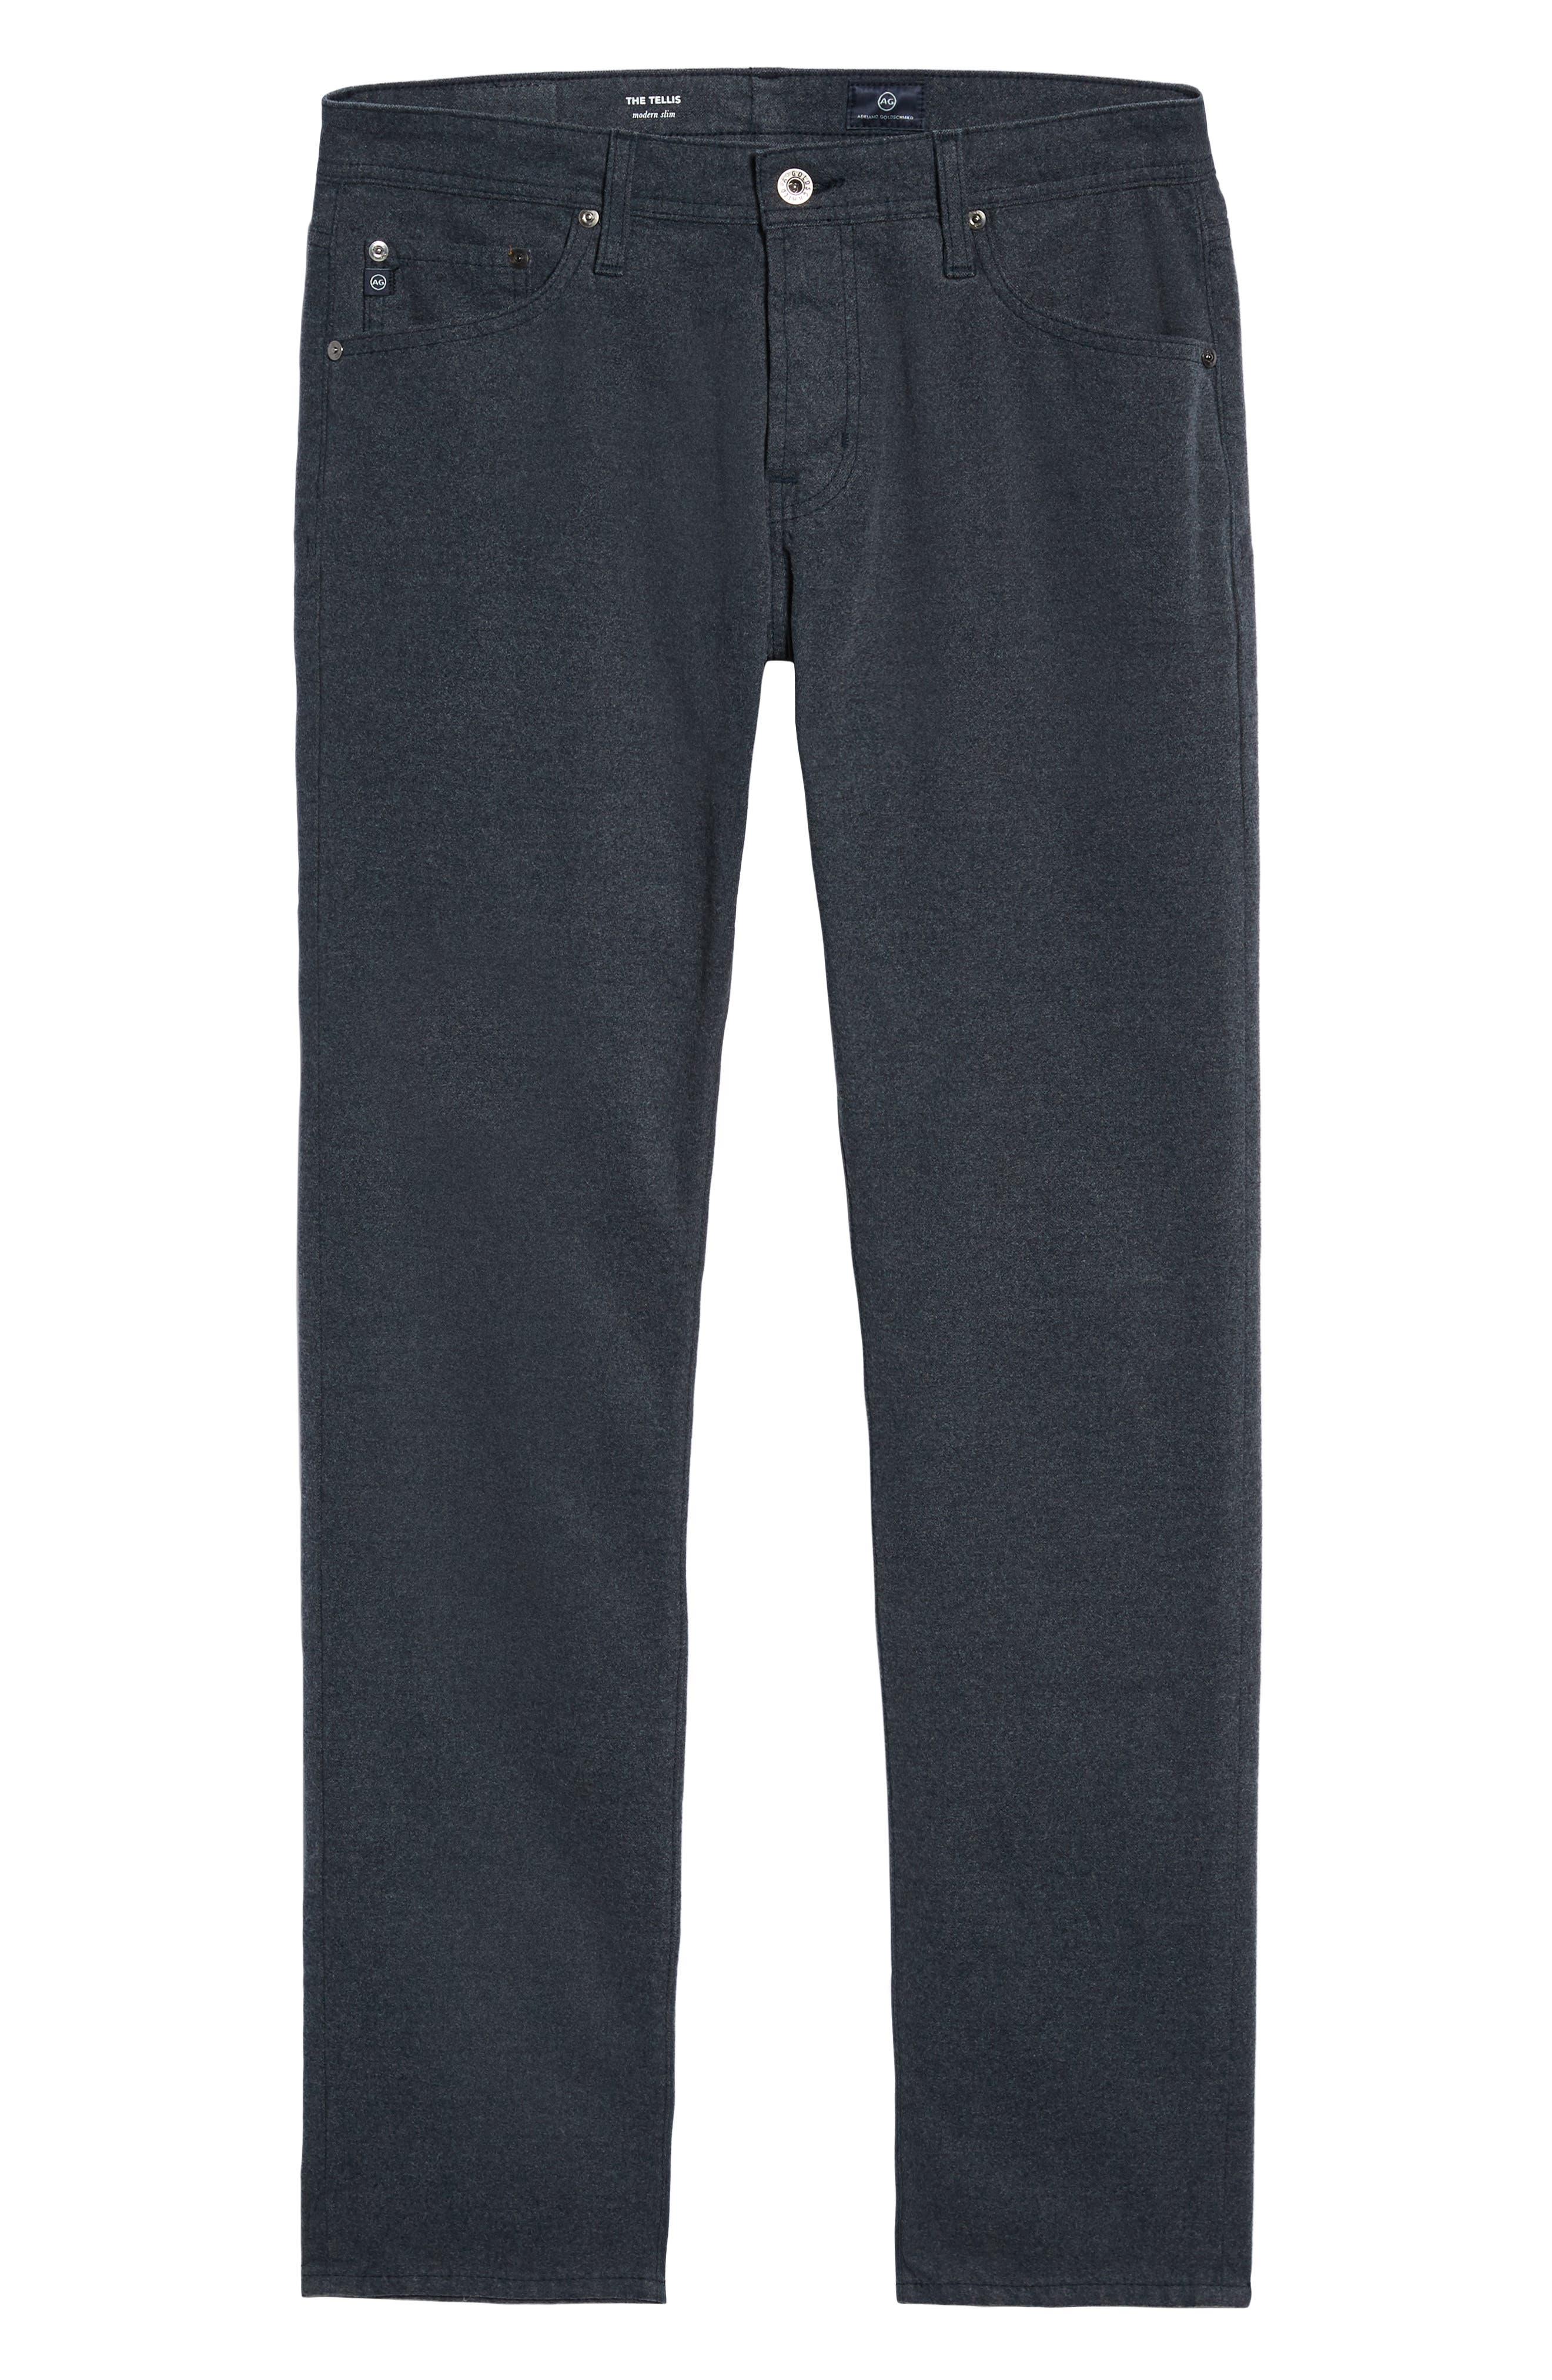 Tellis Slim Fit Five-Pocket Pants,                             Alternate thumbnail 24, color,